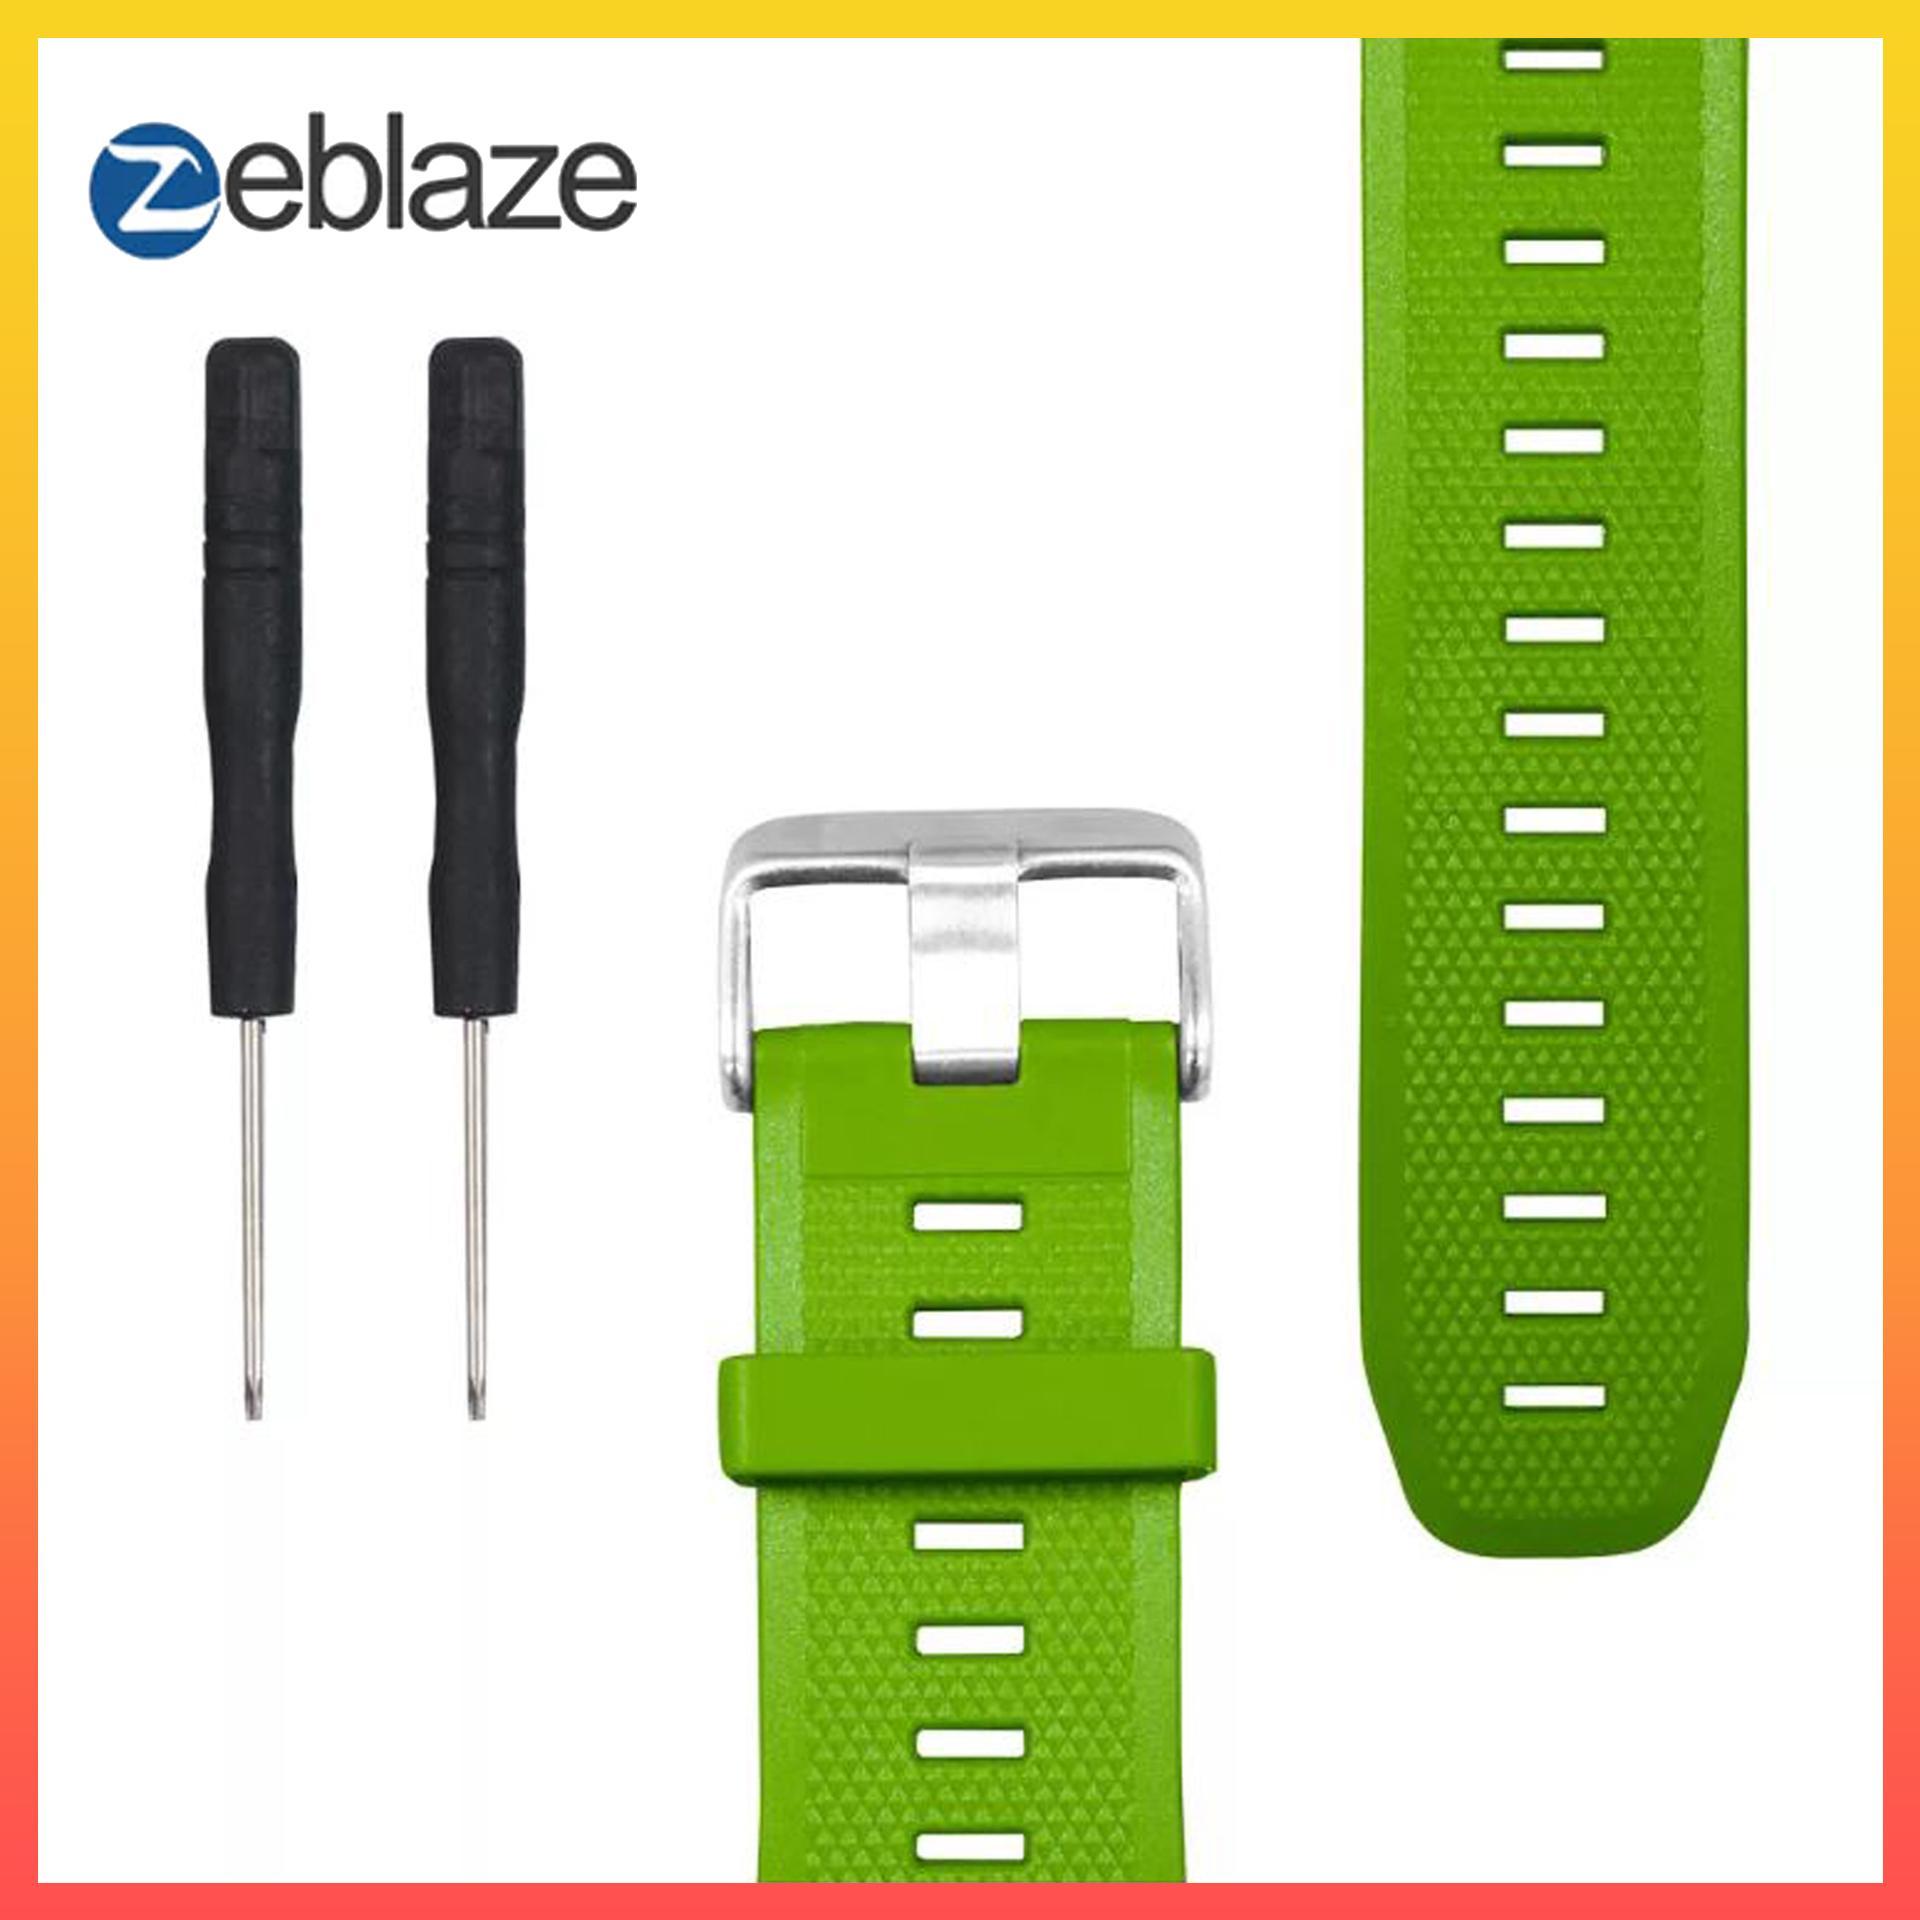 Zeblaze Buy Zeblaze At Best Price In Philippines Www Lazada Com Ph